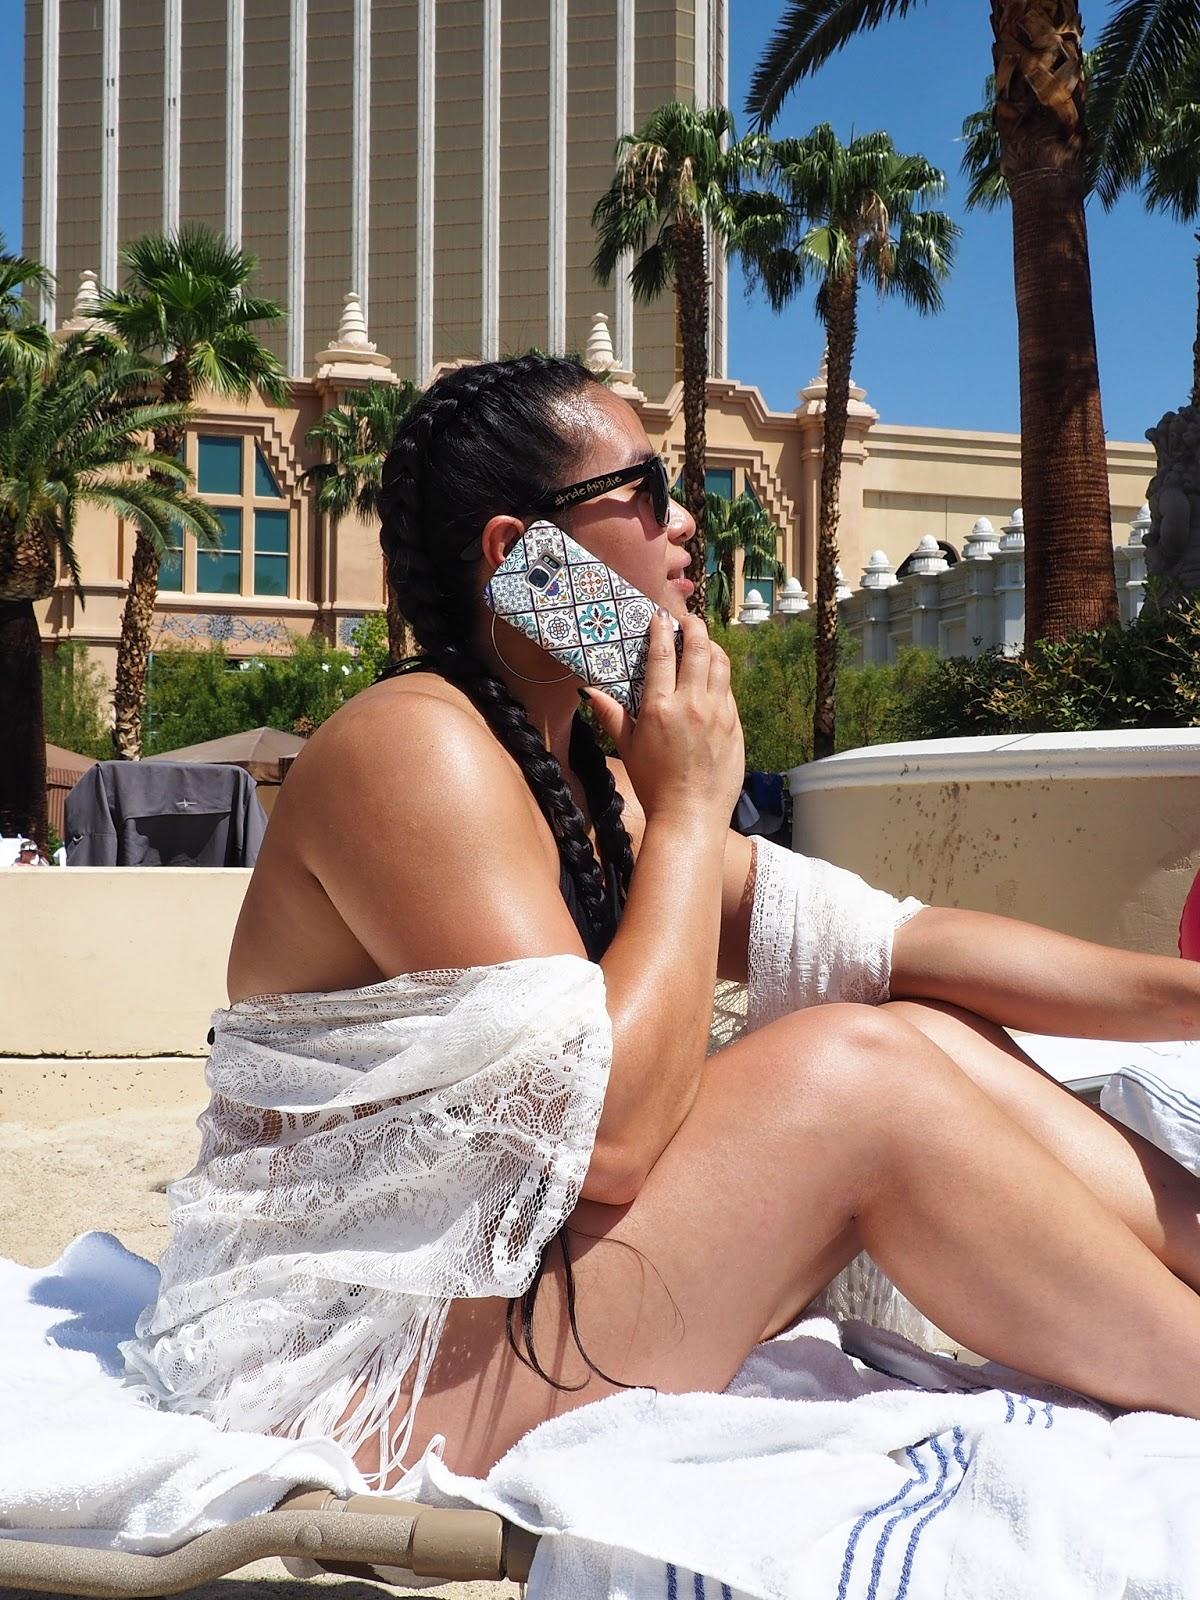 las vegas mandalay bay white crochet braids ootd phone case